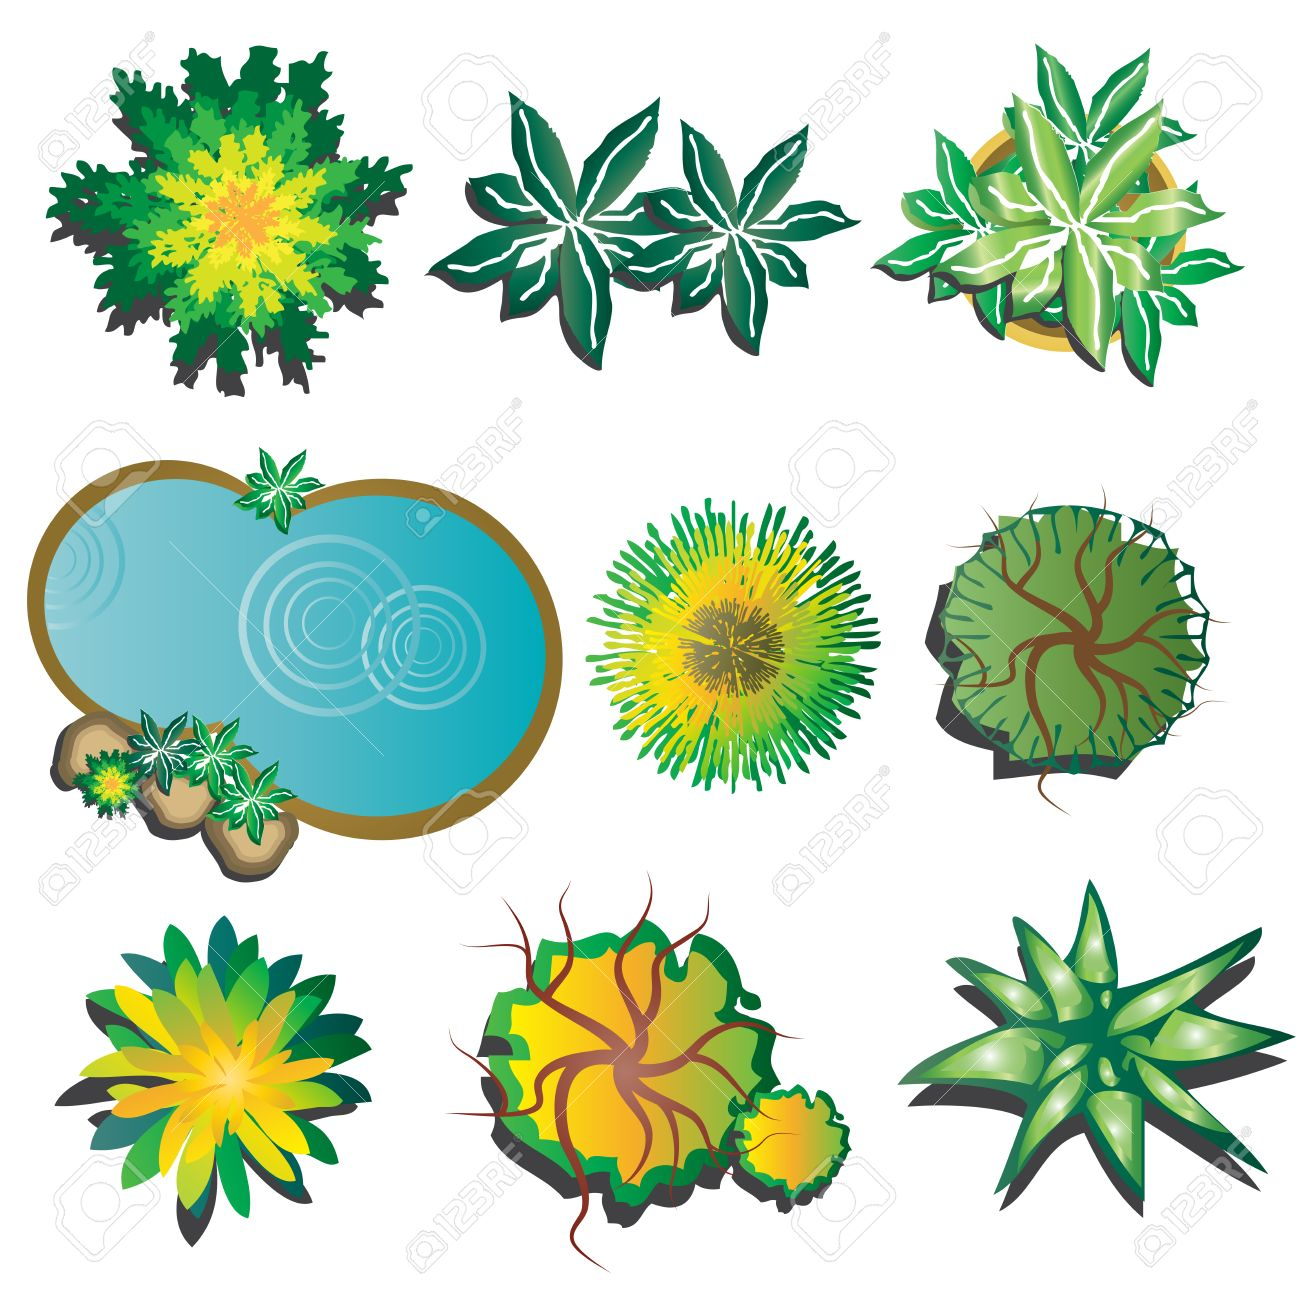 plants top view set 2 plants layout plan for landscape vector illustration stock vector